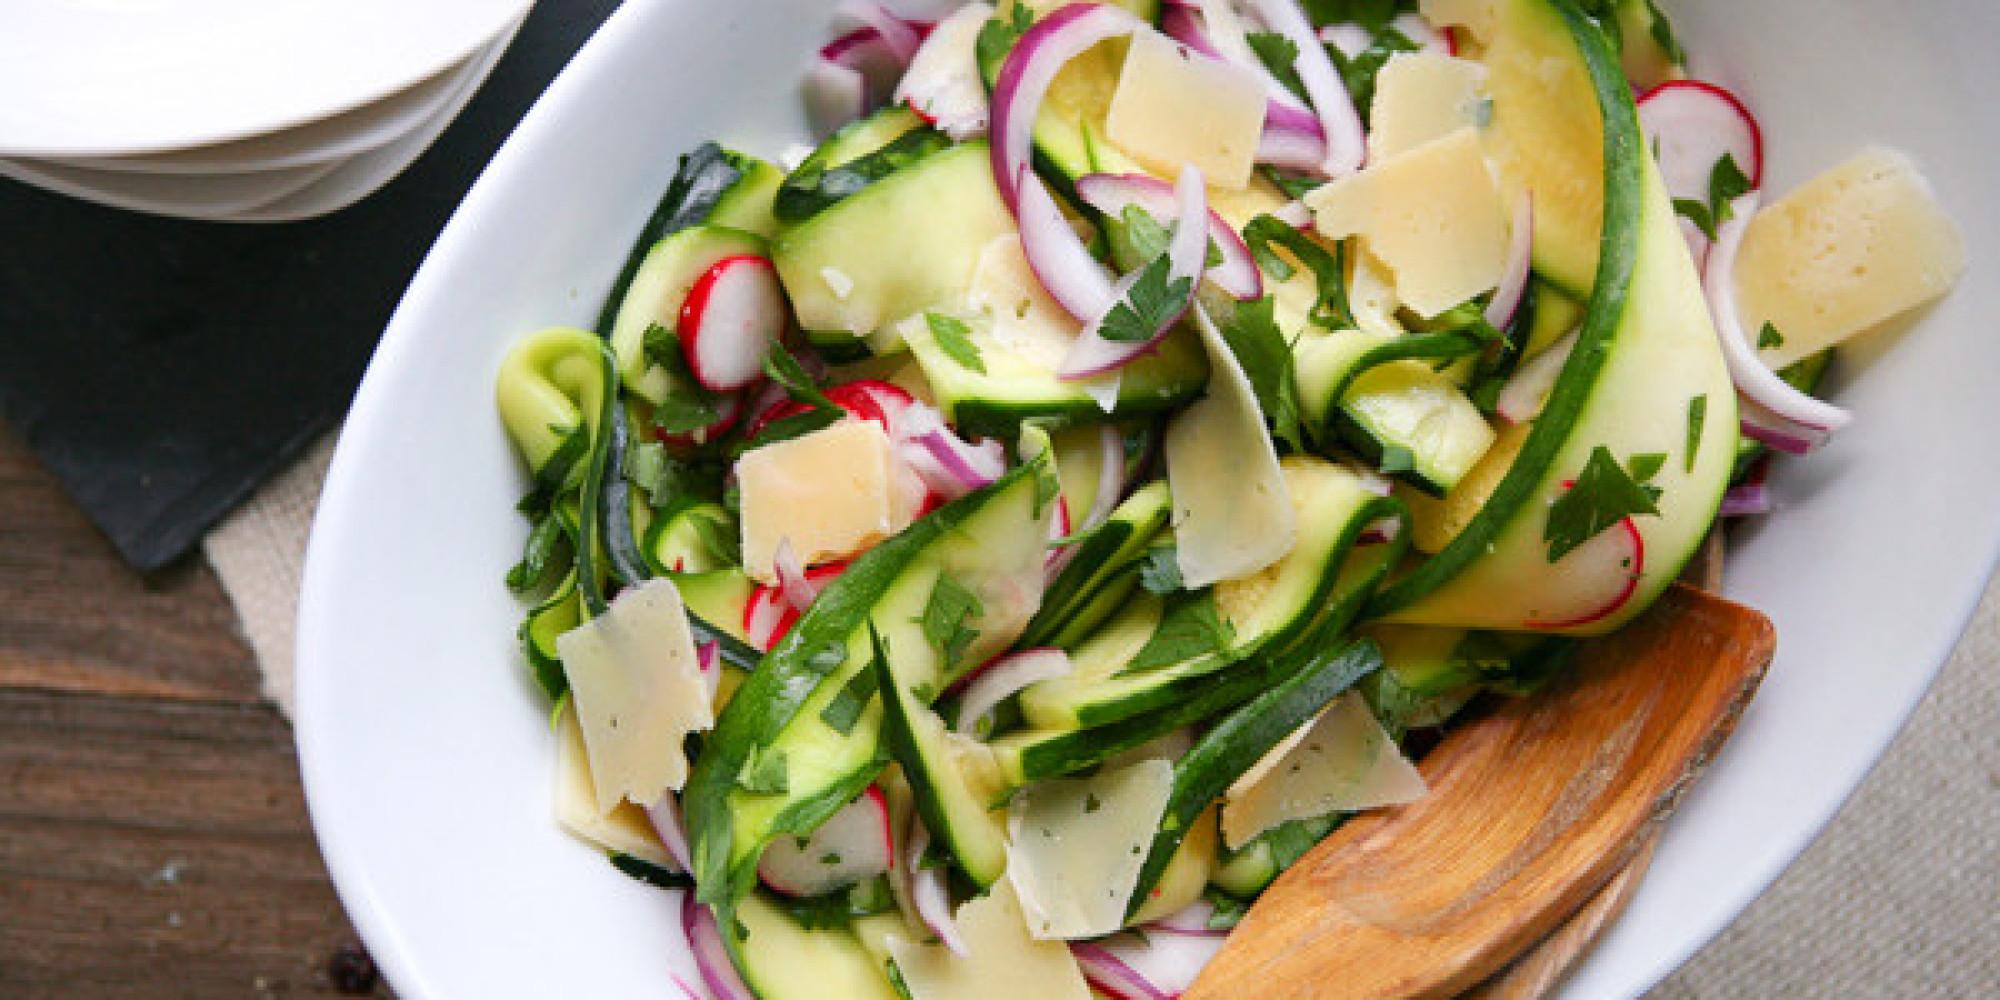 recipes zucchini fall again zuchini ll huffpost making loving